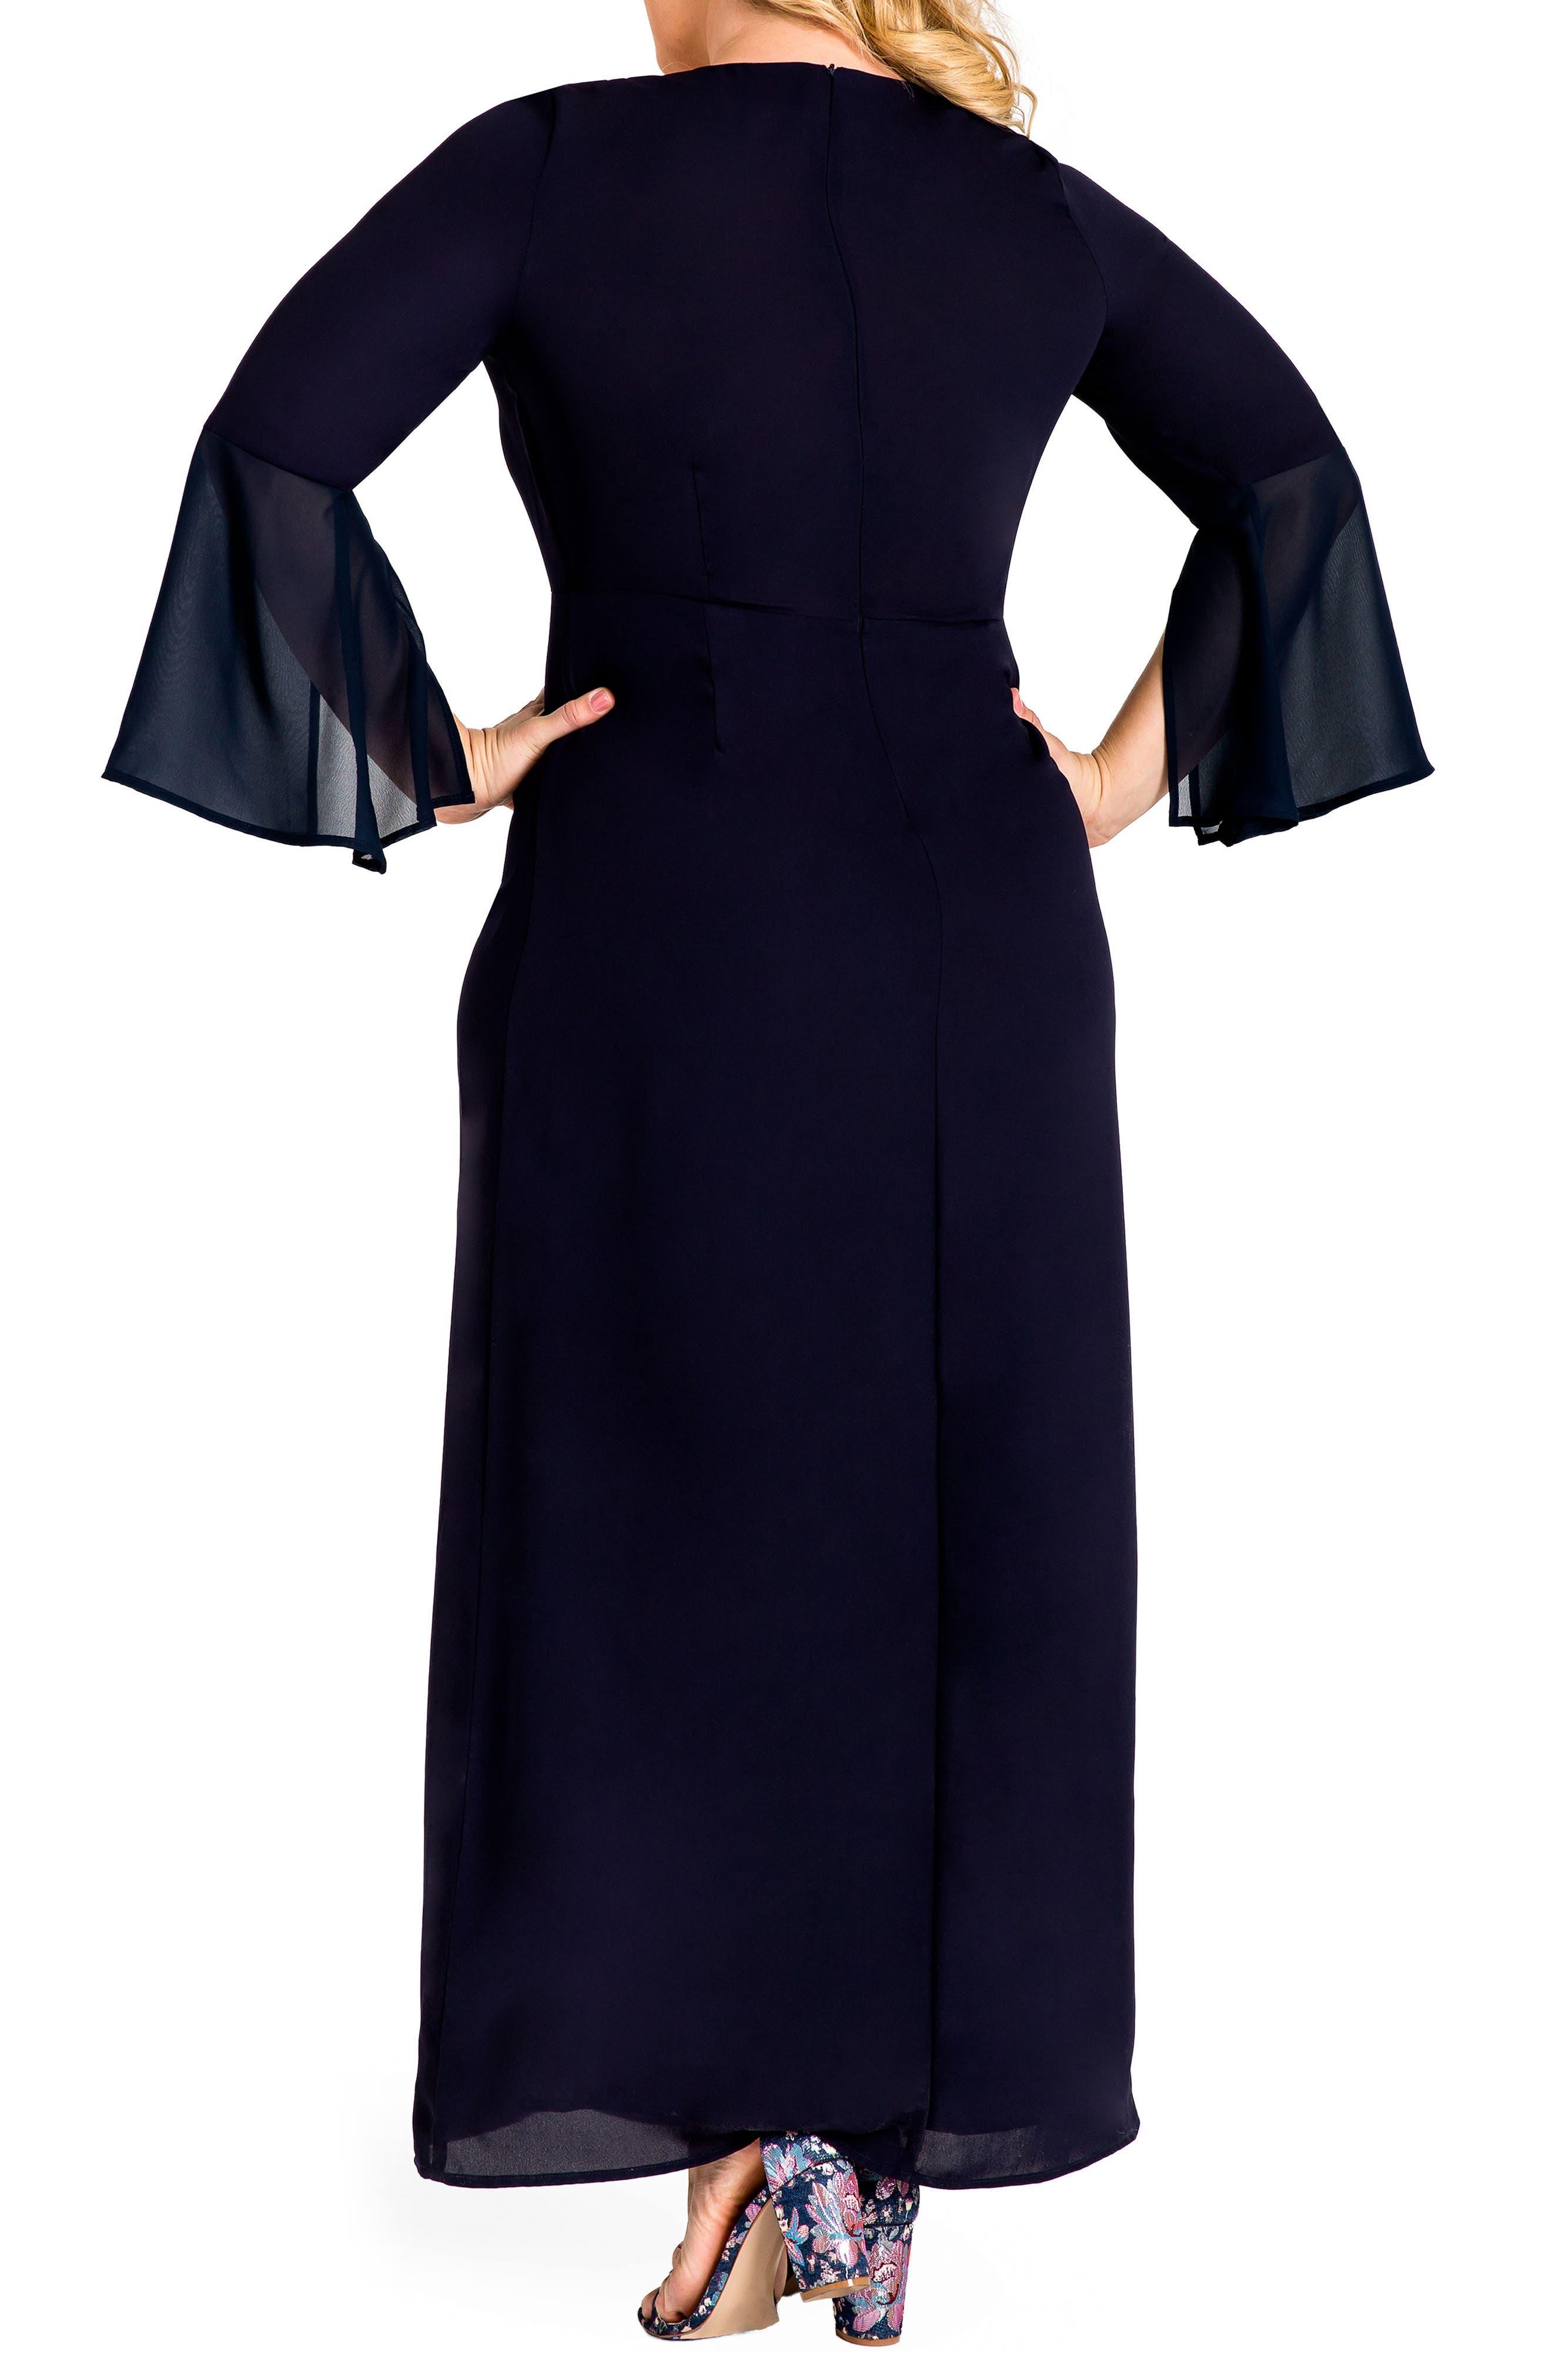 STANDARDS & PRACTICES,                             Norah Maxi Dress,                             Alternate thumbnail 2, color,                             NAVY